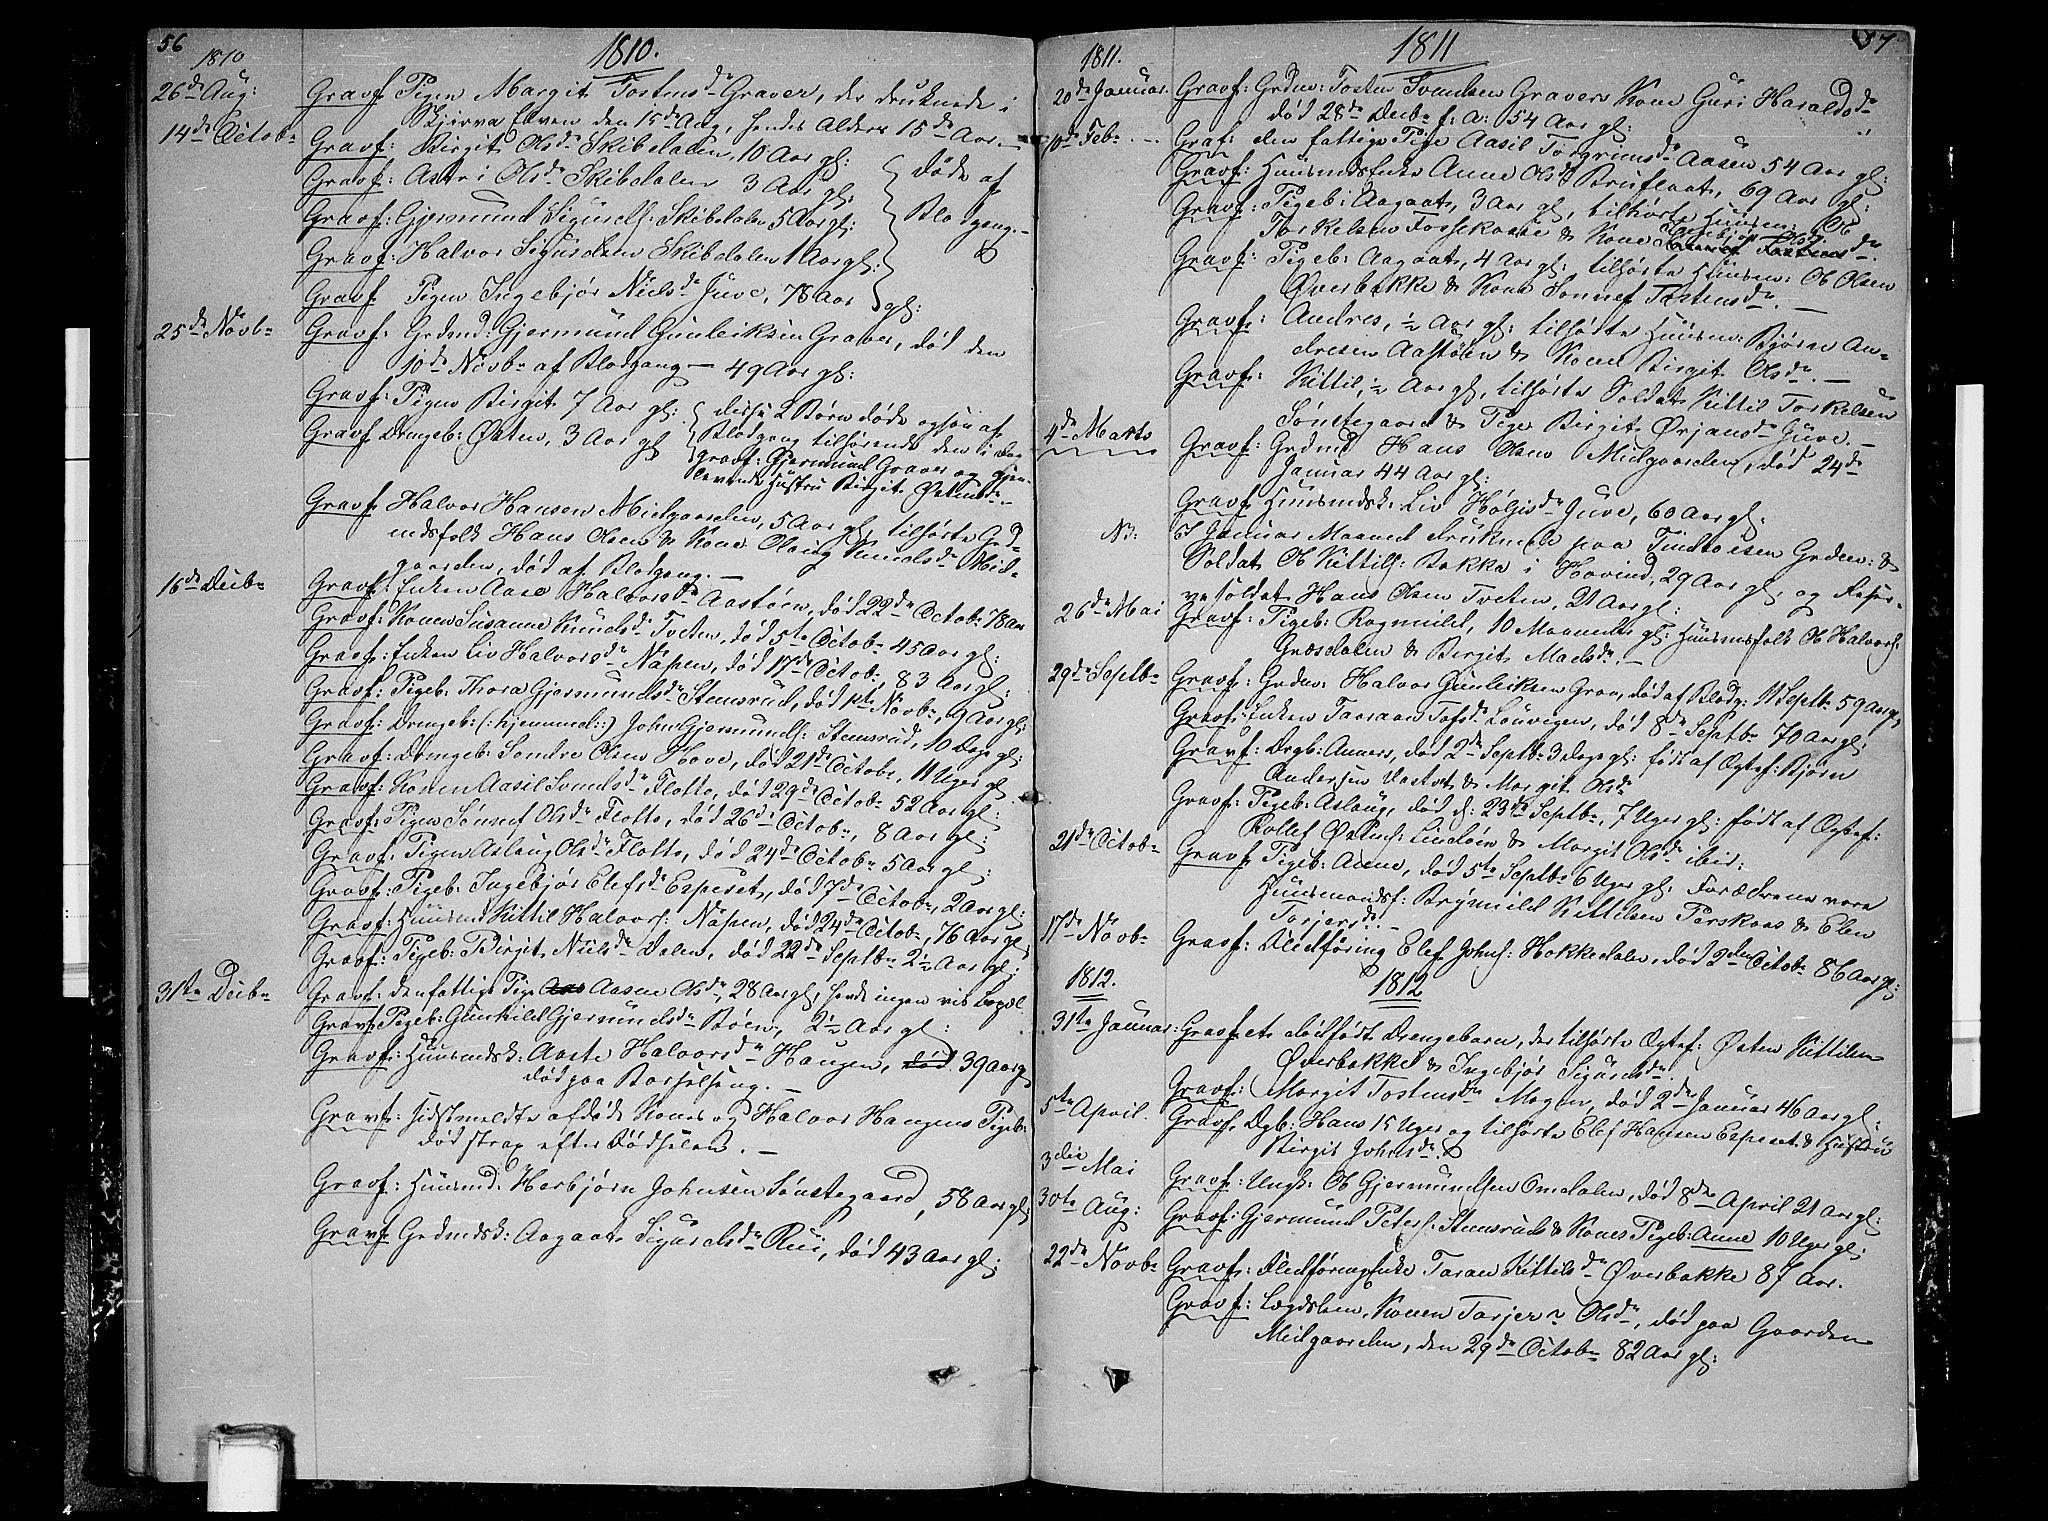 SAKO, Gransherad kirkebøker, F/Fb/L0001: Ministerialbok nr. II 1, 1800-1814, s. 56-57